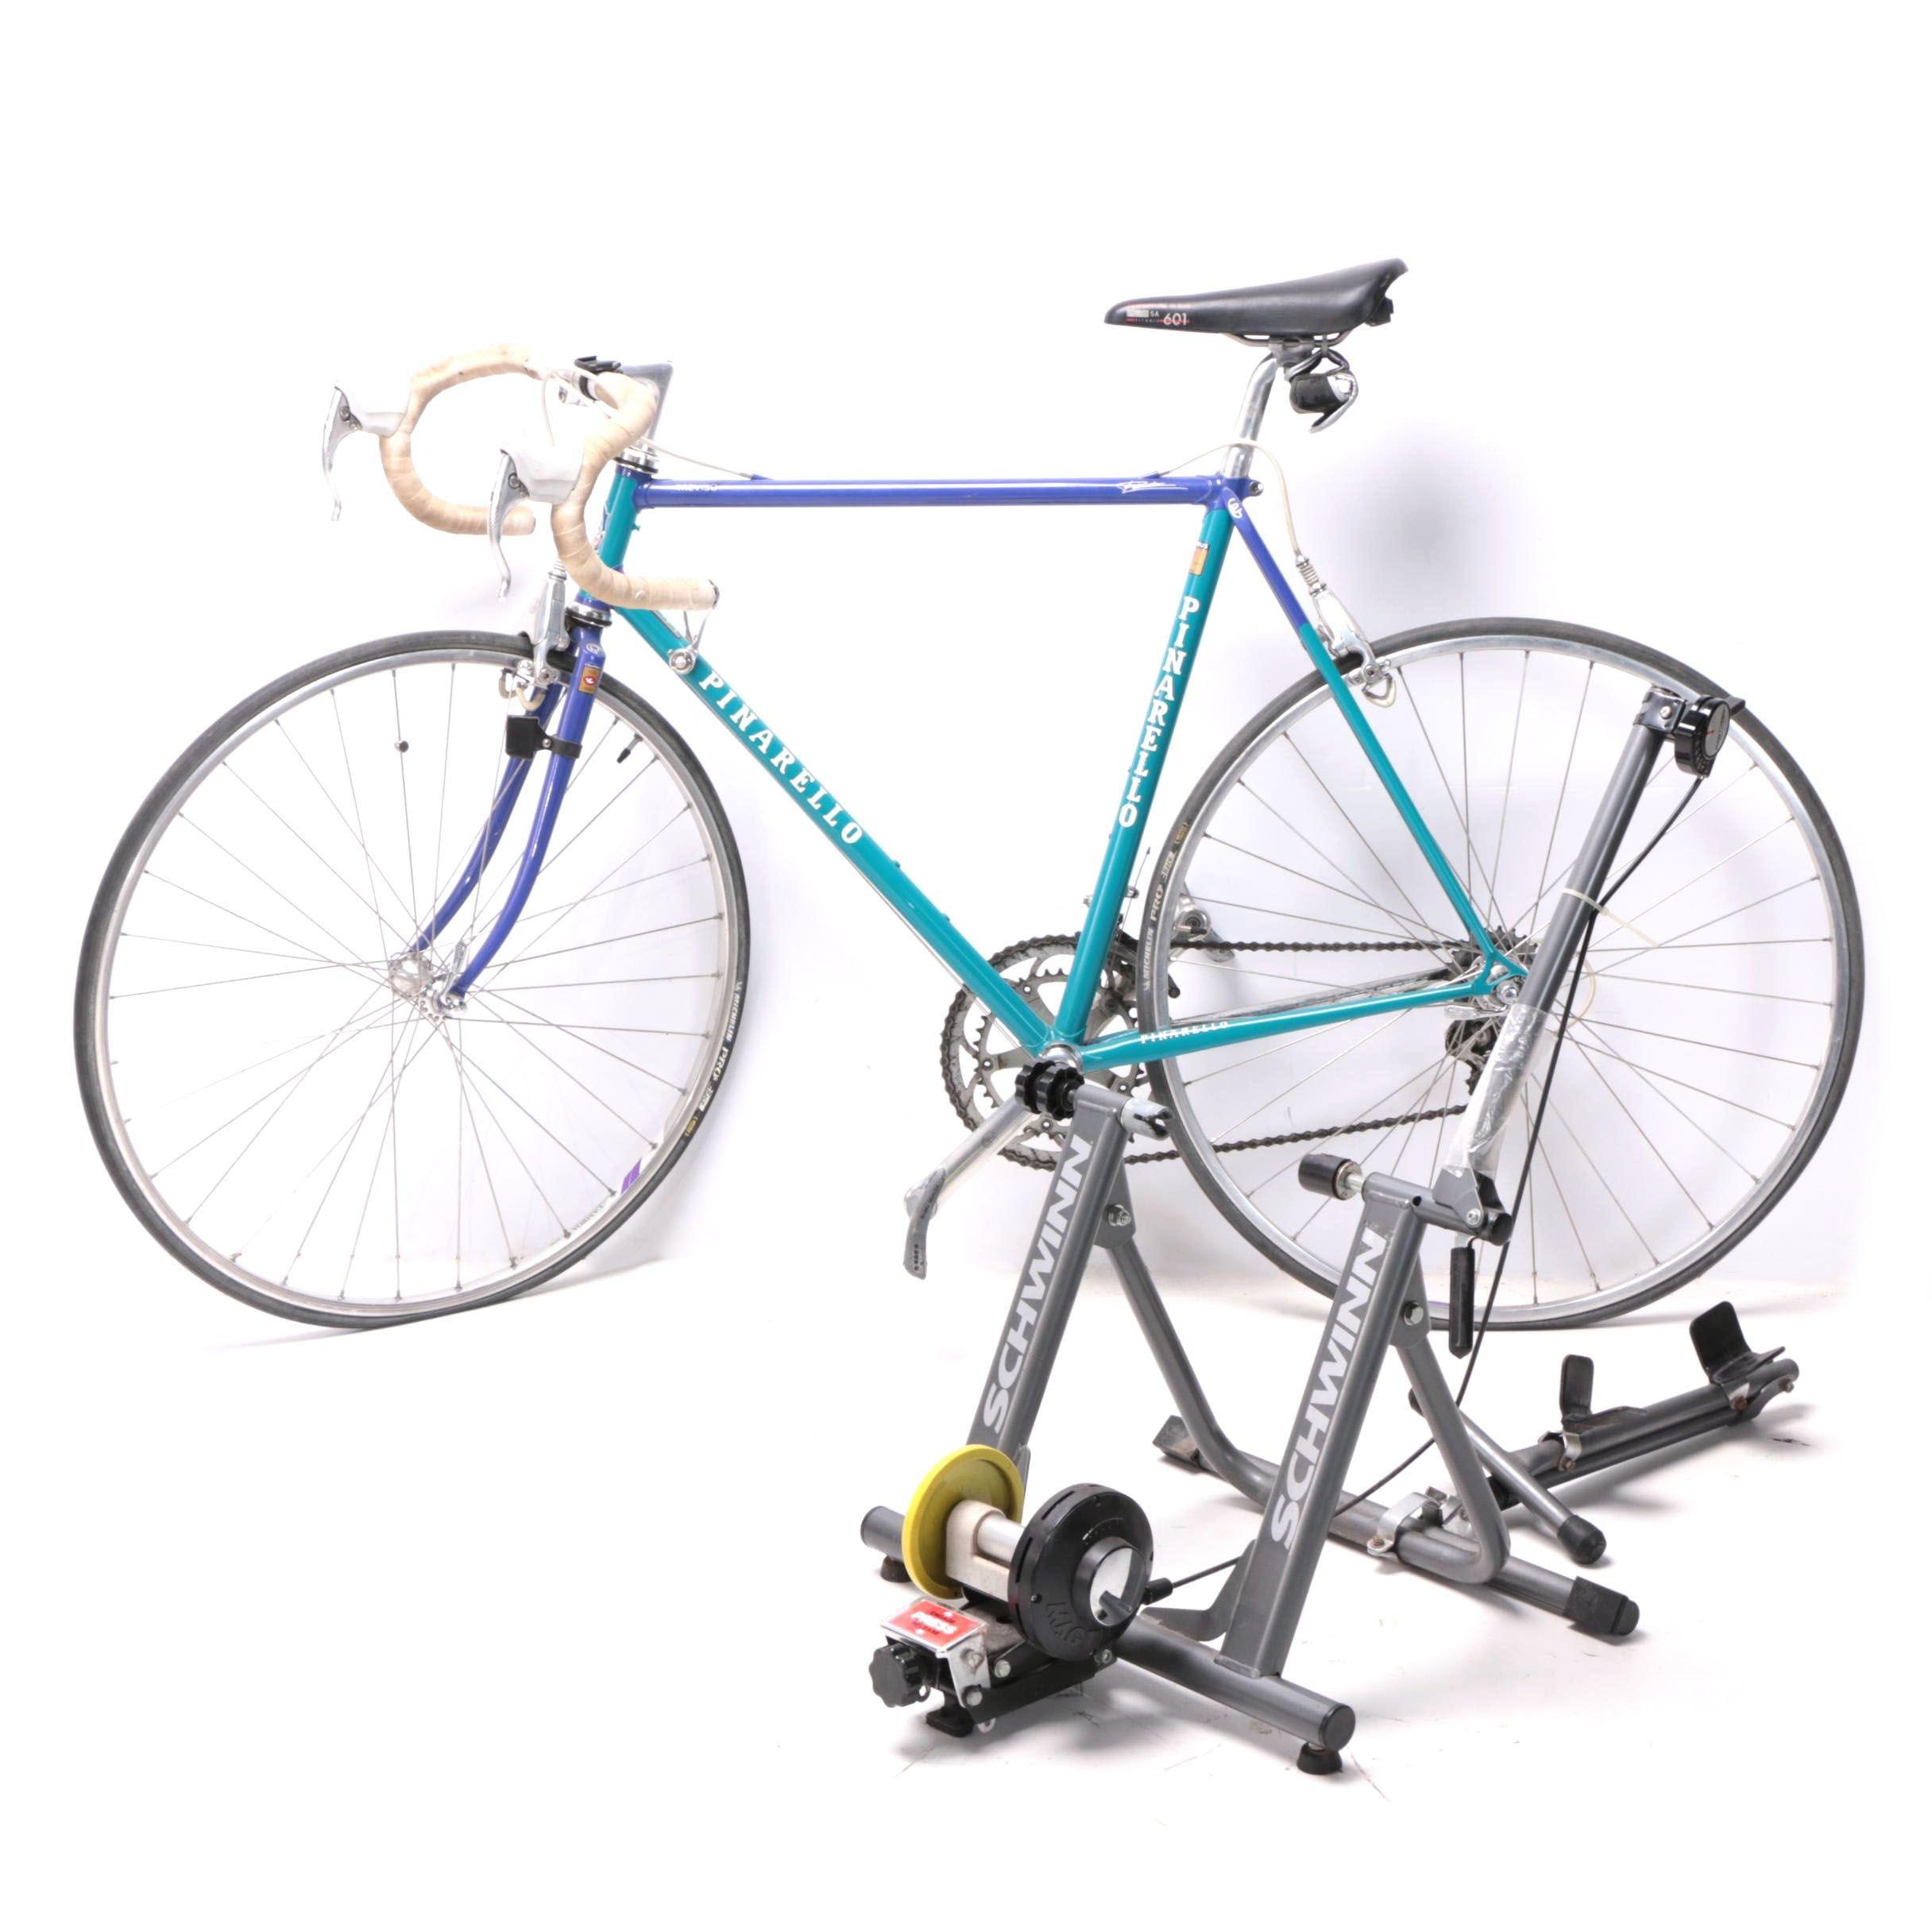 Pinarello Treviso Italia Bicycle and Schwinn Mag Turbo Bike Trainer